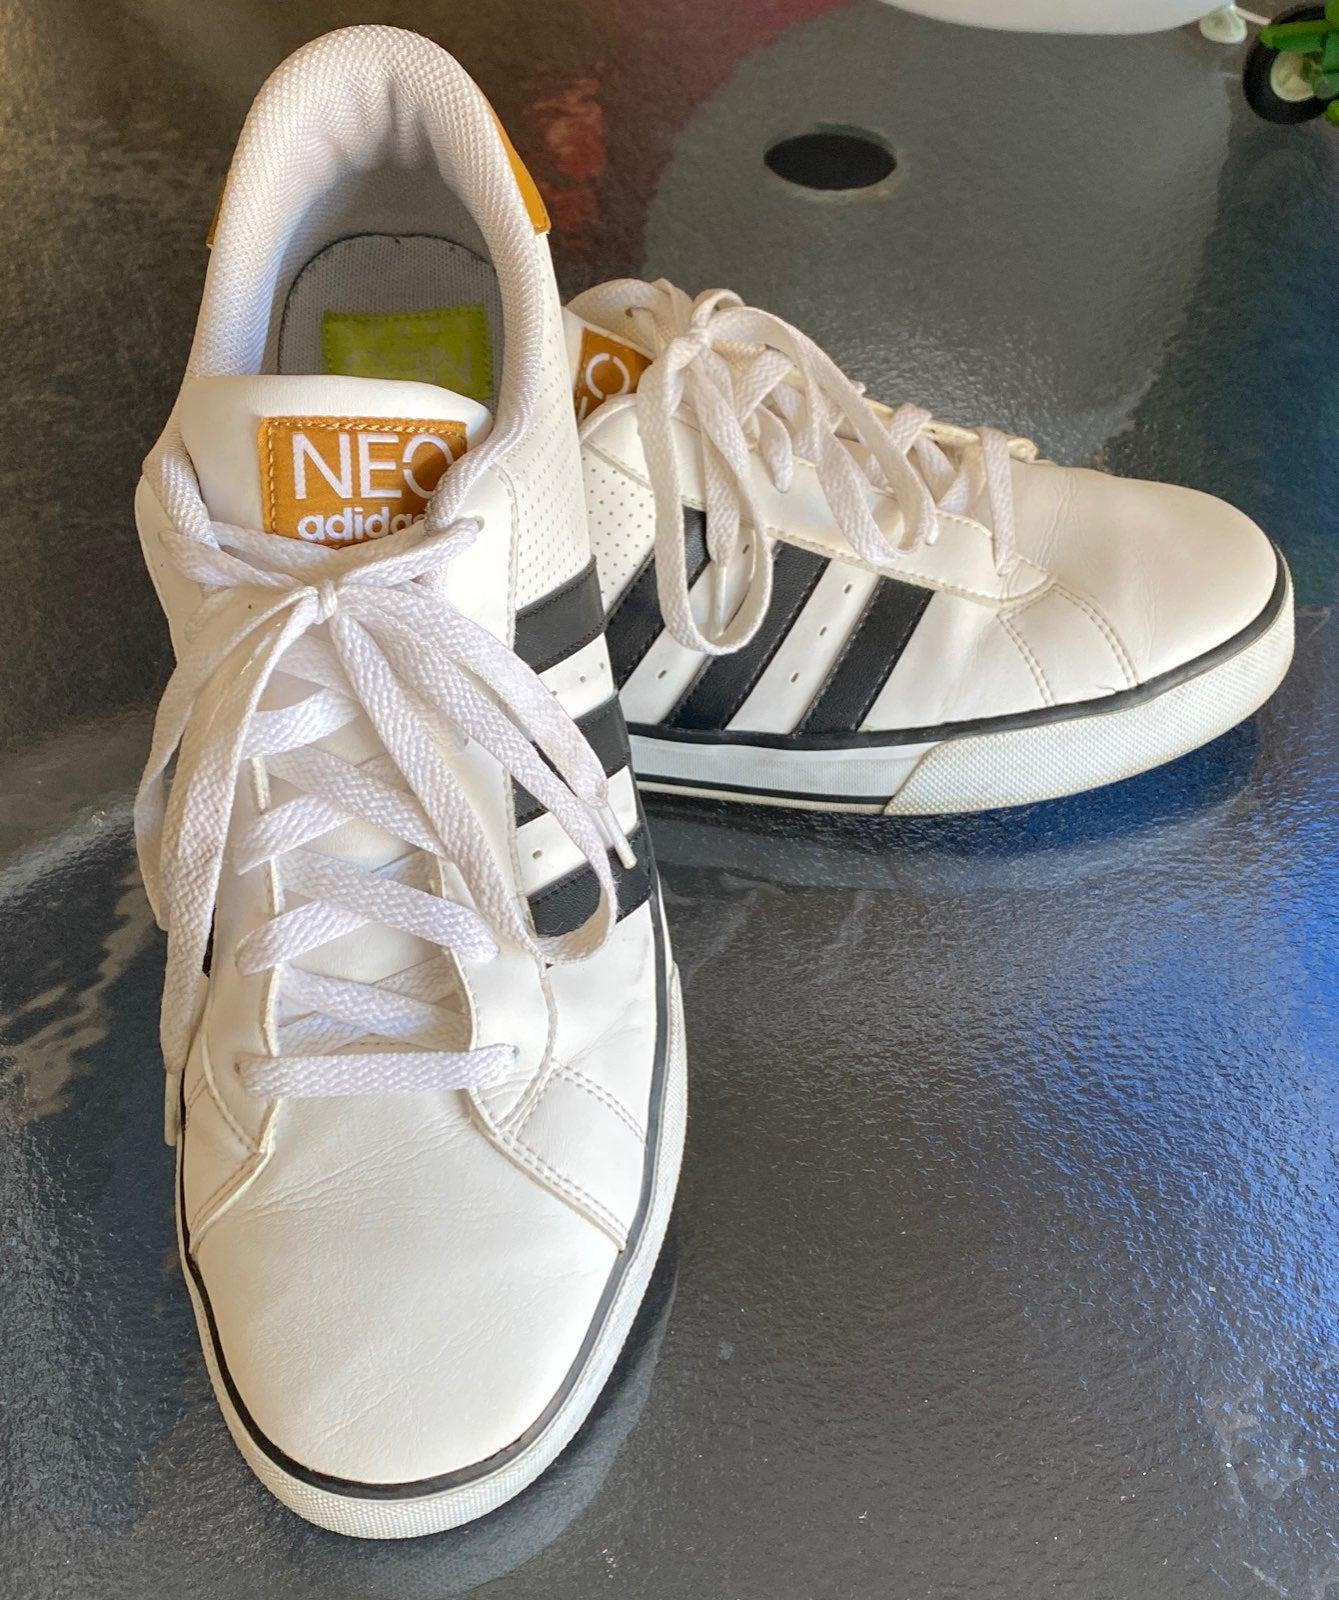 Adidas G31373 Mens shoes